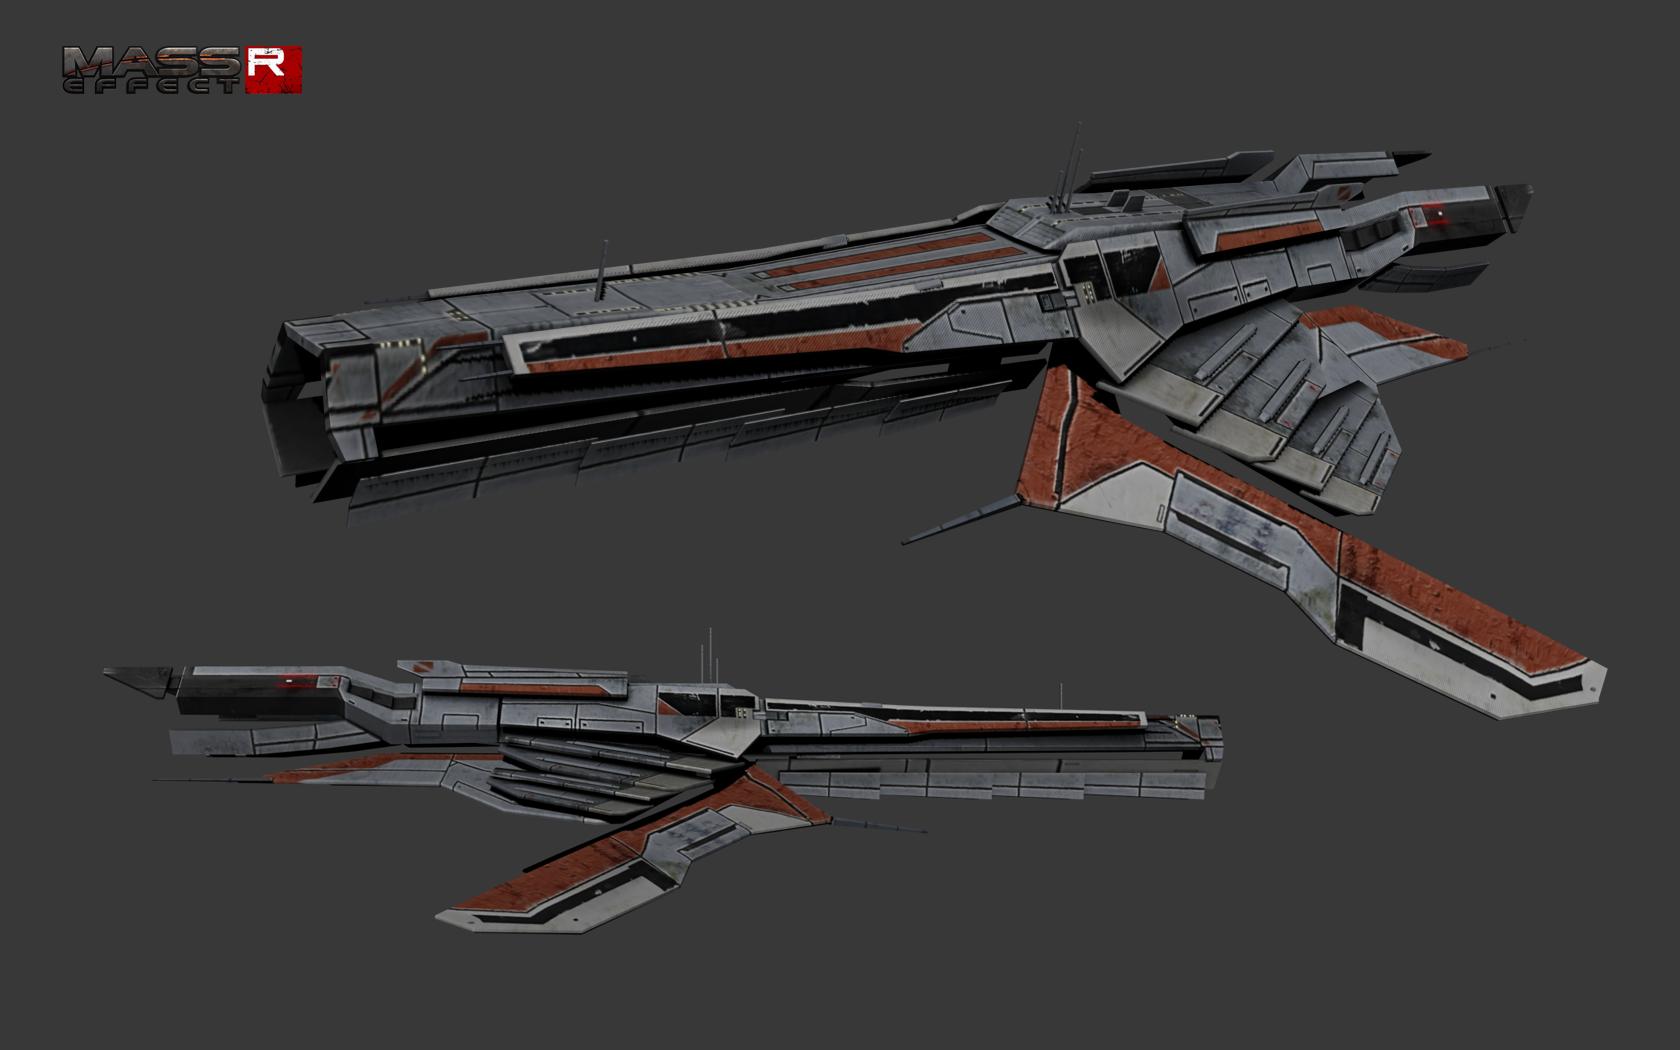 Turian Cruiser V2 Image Classic Mass Effect Reborn Mod For